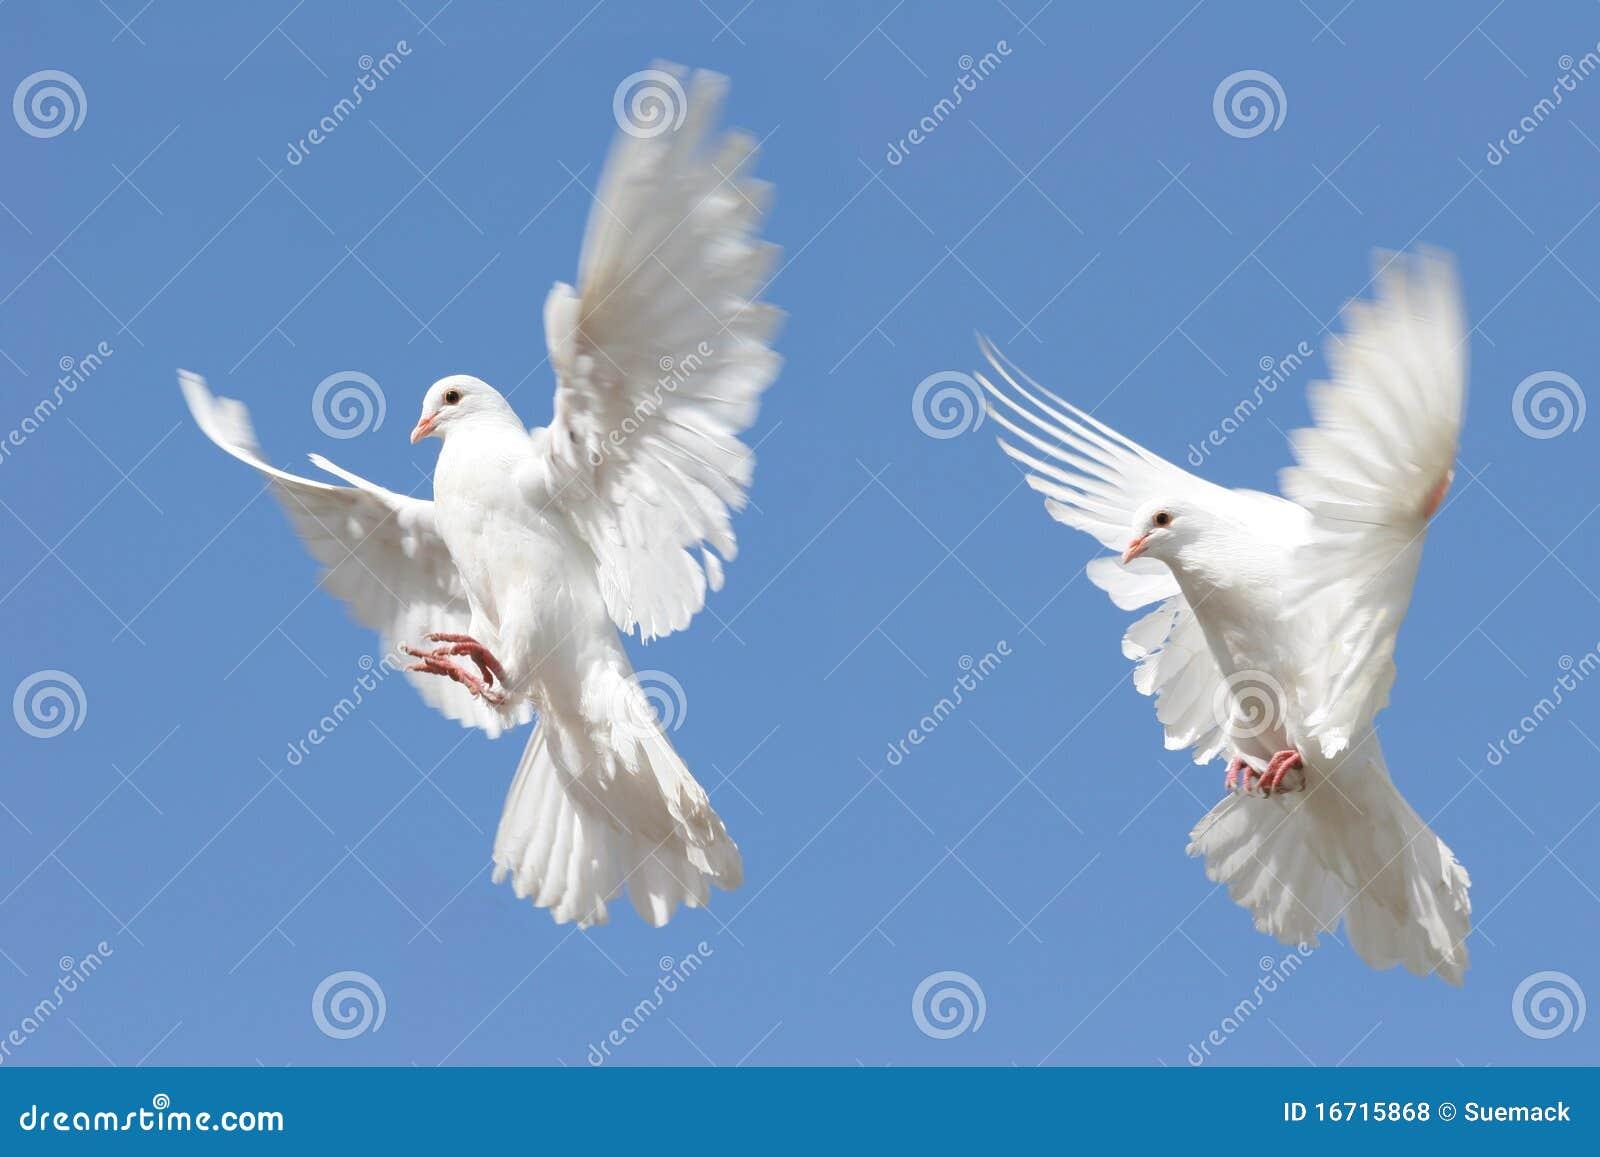 White Dove In Flight Royalty Free Stock Photos Image 16715868